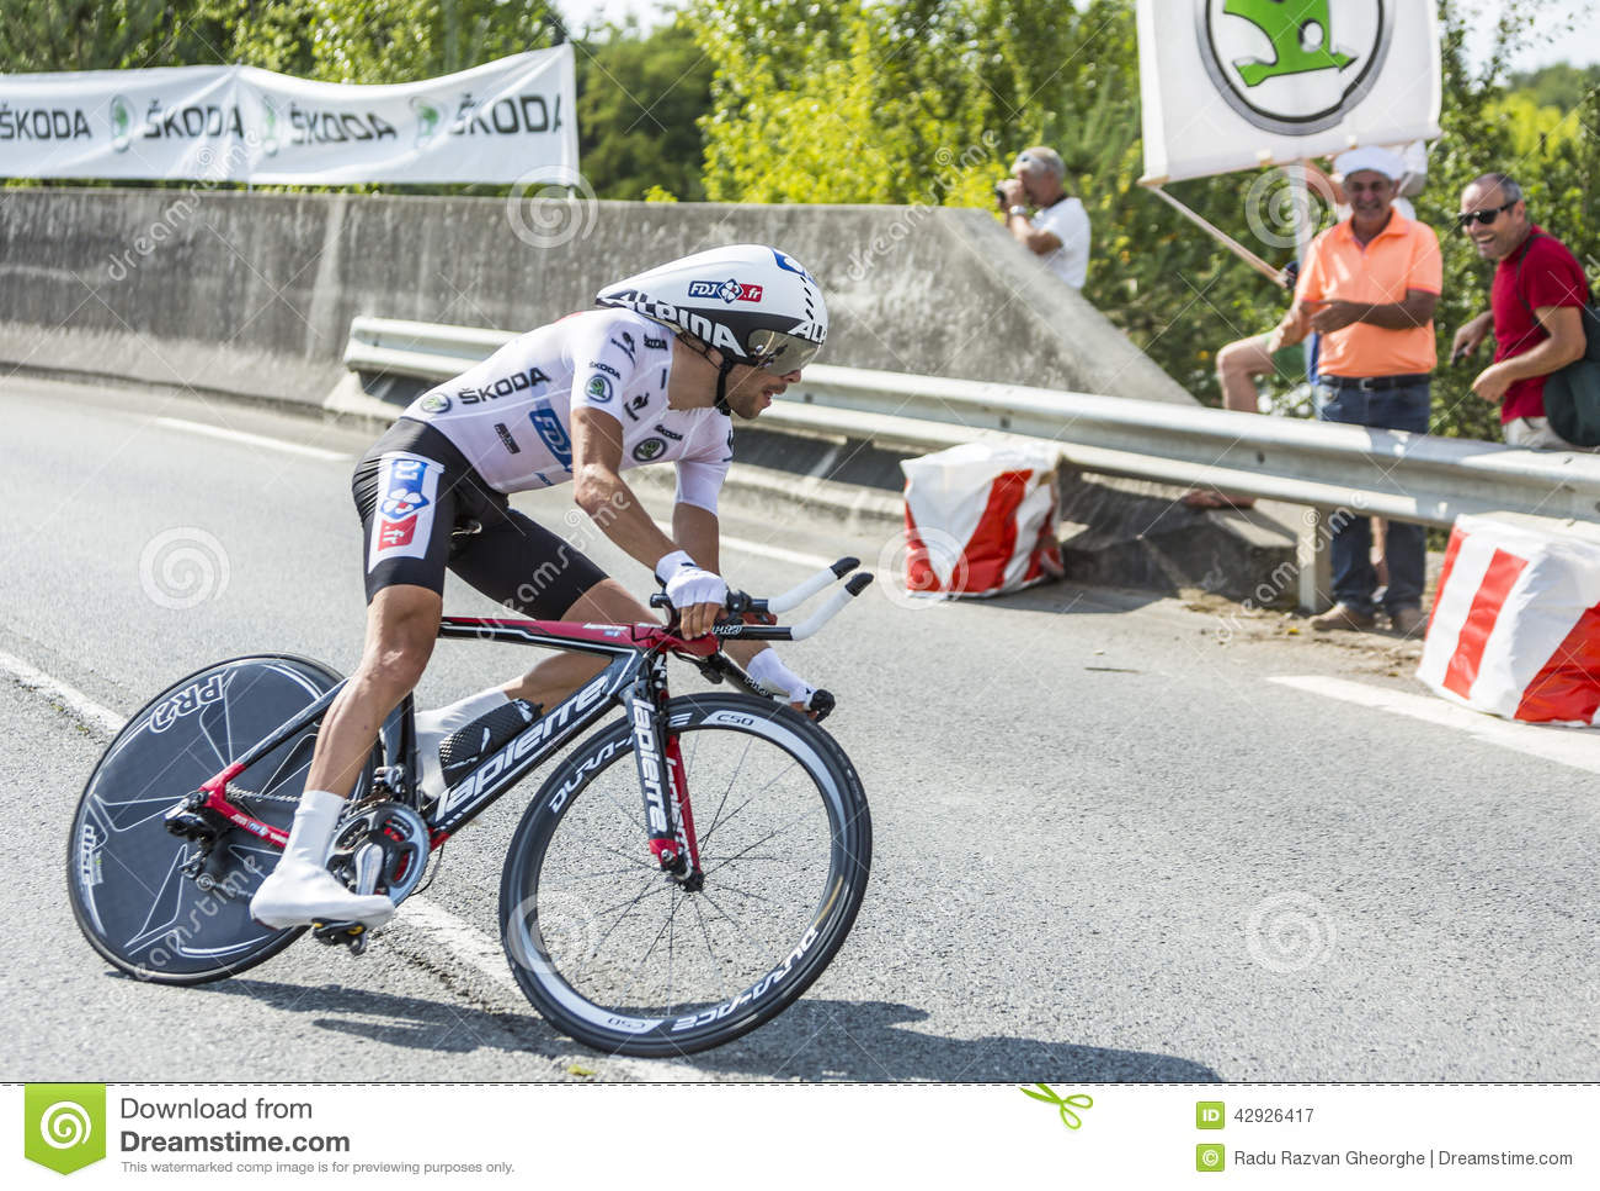 The Cyclist Thibaut Pinot